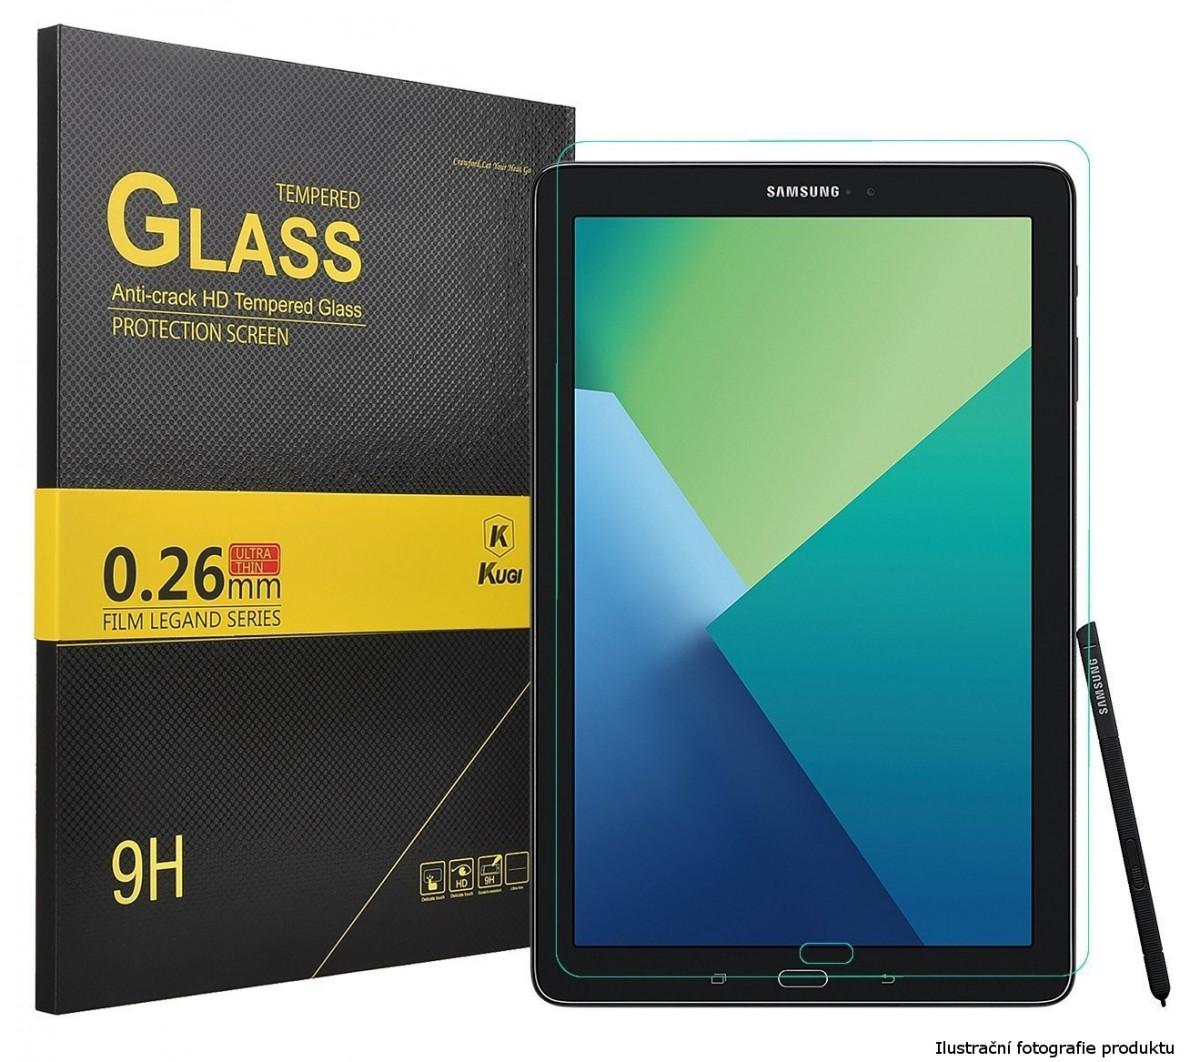 Ochranné tvrzené sklo 9H na displej pro Samsung Galaxy Tab A 10.1 (2016) - T580 / T585